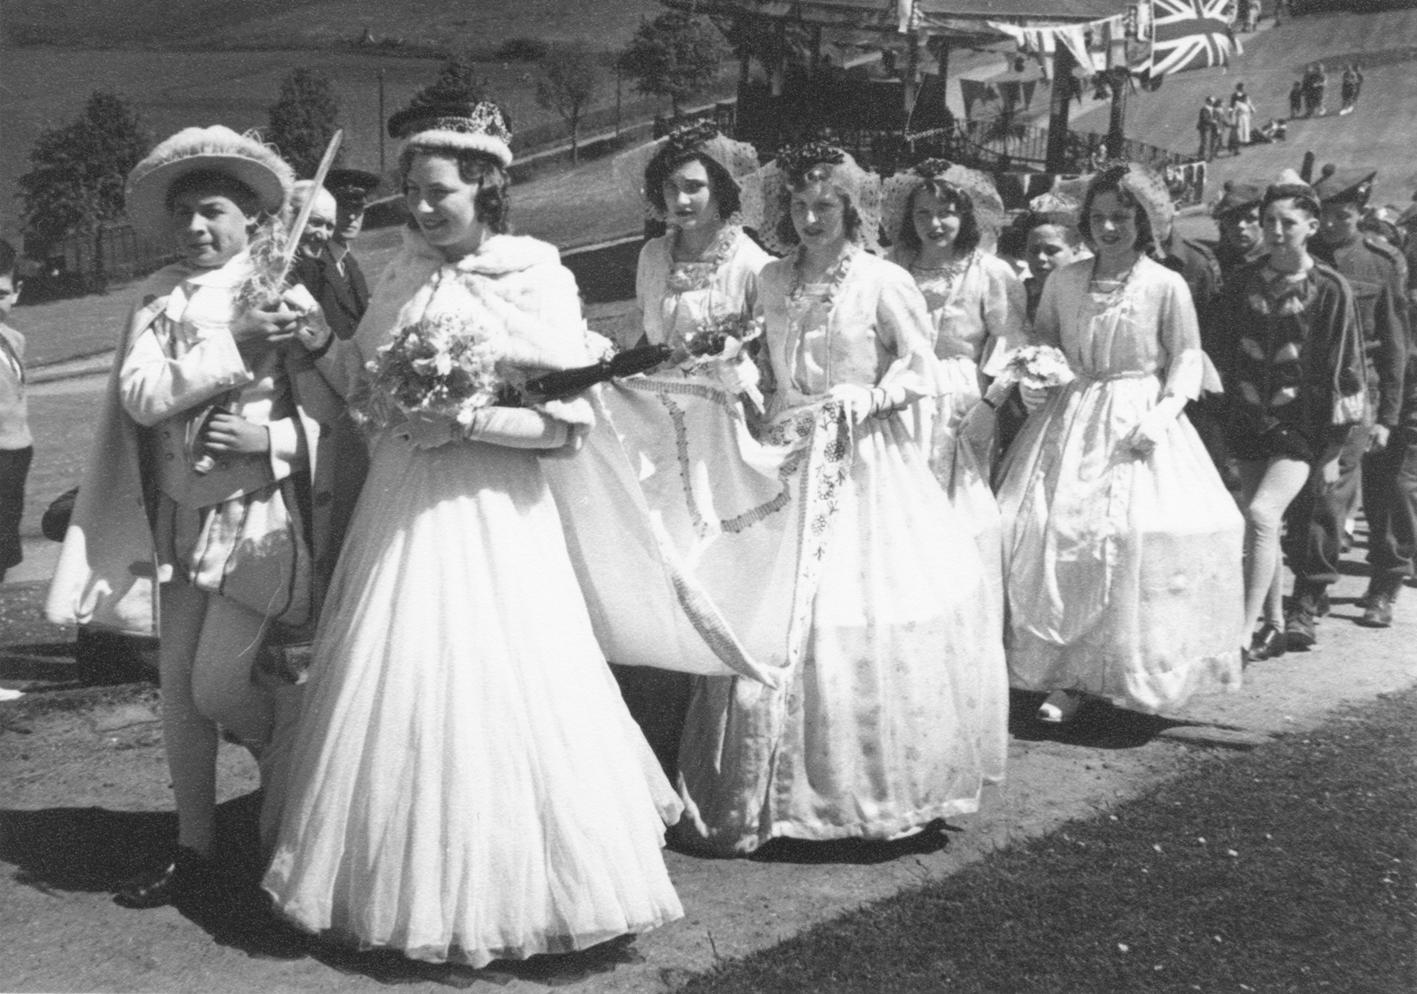 53-galaa-day-1949